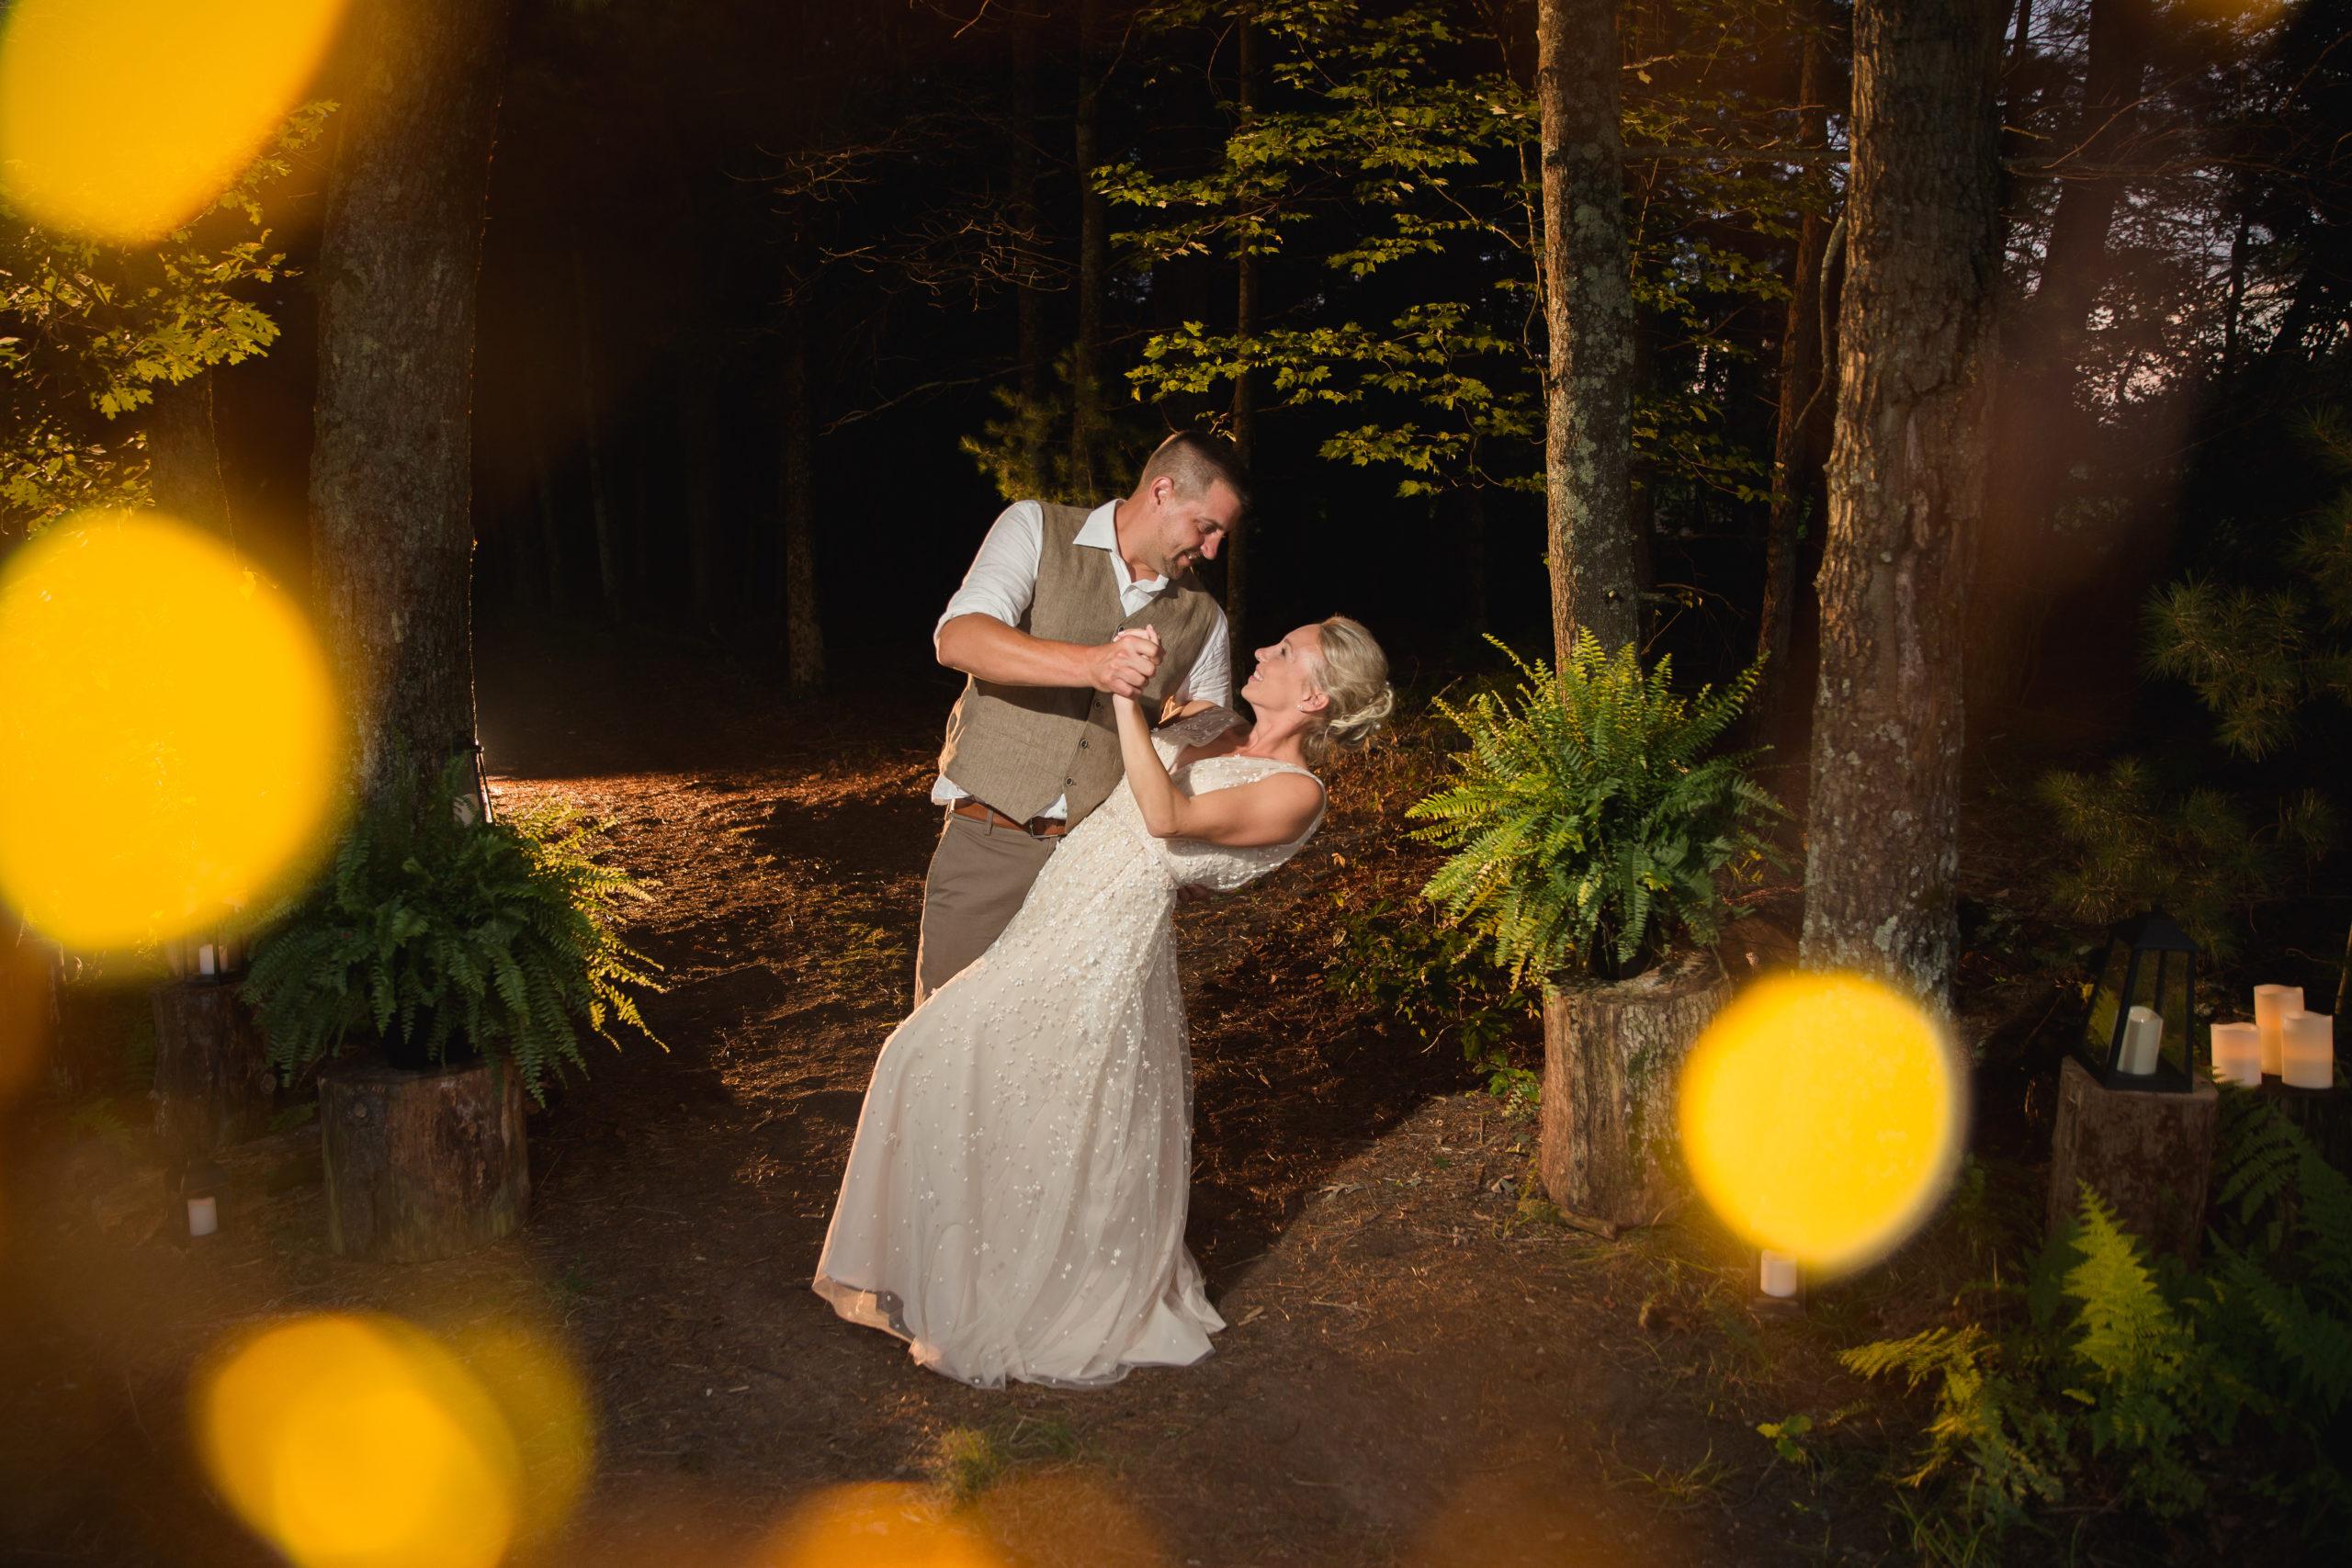 Coventry, Rhode Island, RI, Backyard Wedding, forest, earthy, wedding, tracy jenkins photography, wedding photographer, ri wedding photographer, Rhode Island Wedding photographer, couple photos, fairy lights